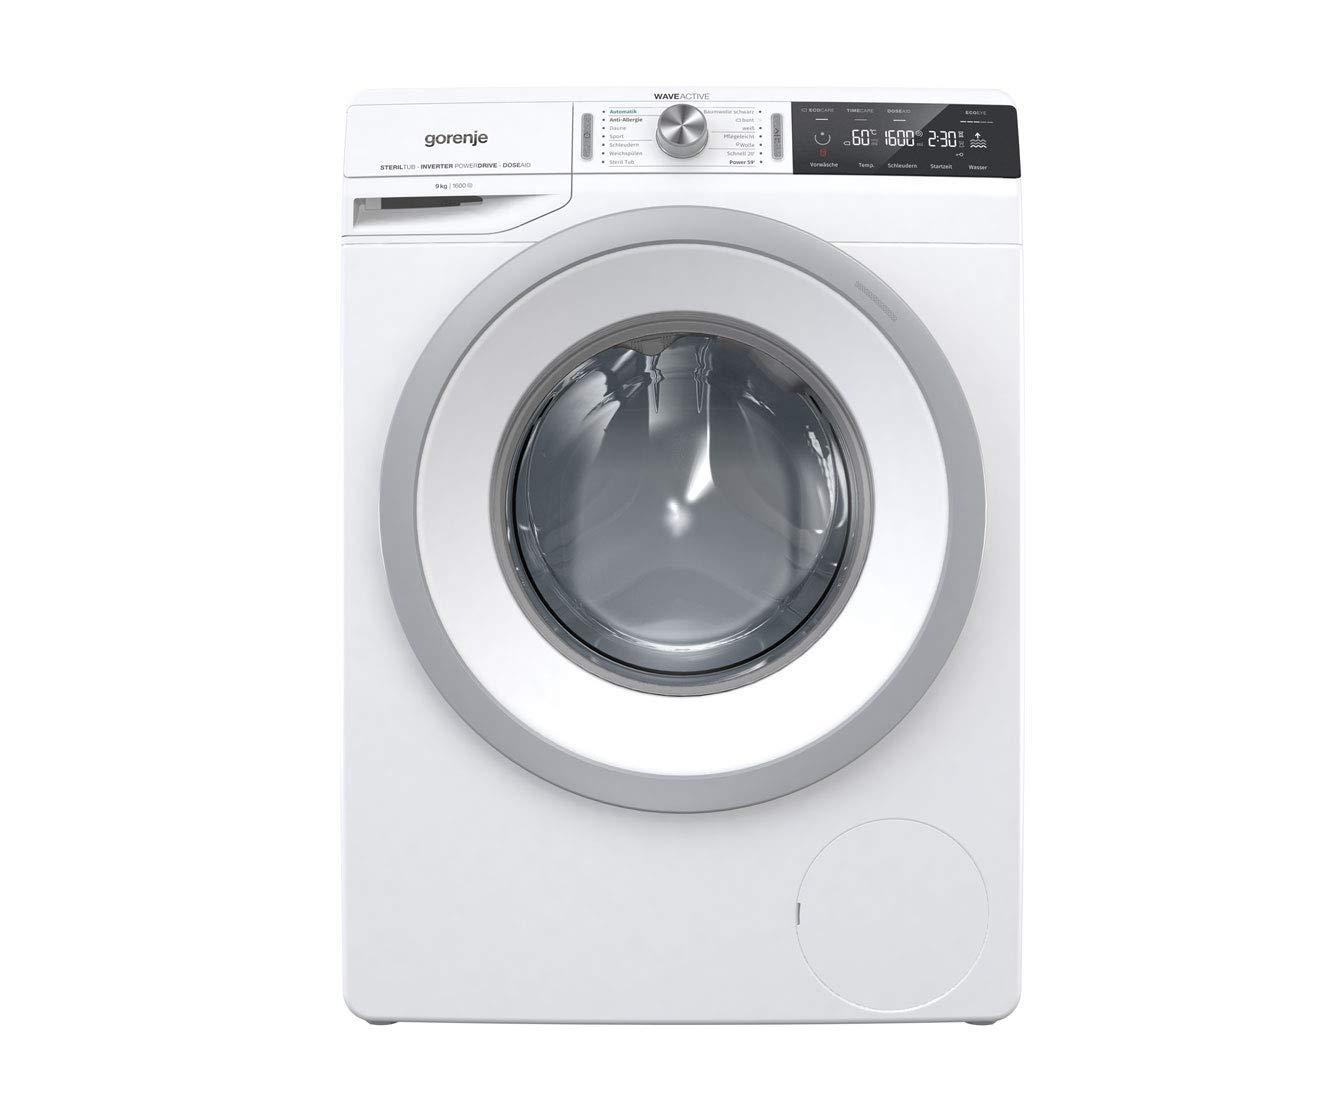 Gorenje-WA966T-Waschmaschine-freistehend-Frontlader-9-kg-1600-Umin-A-Wei-freistehend-Frontlader-drehbar-LED-64-l